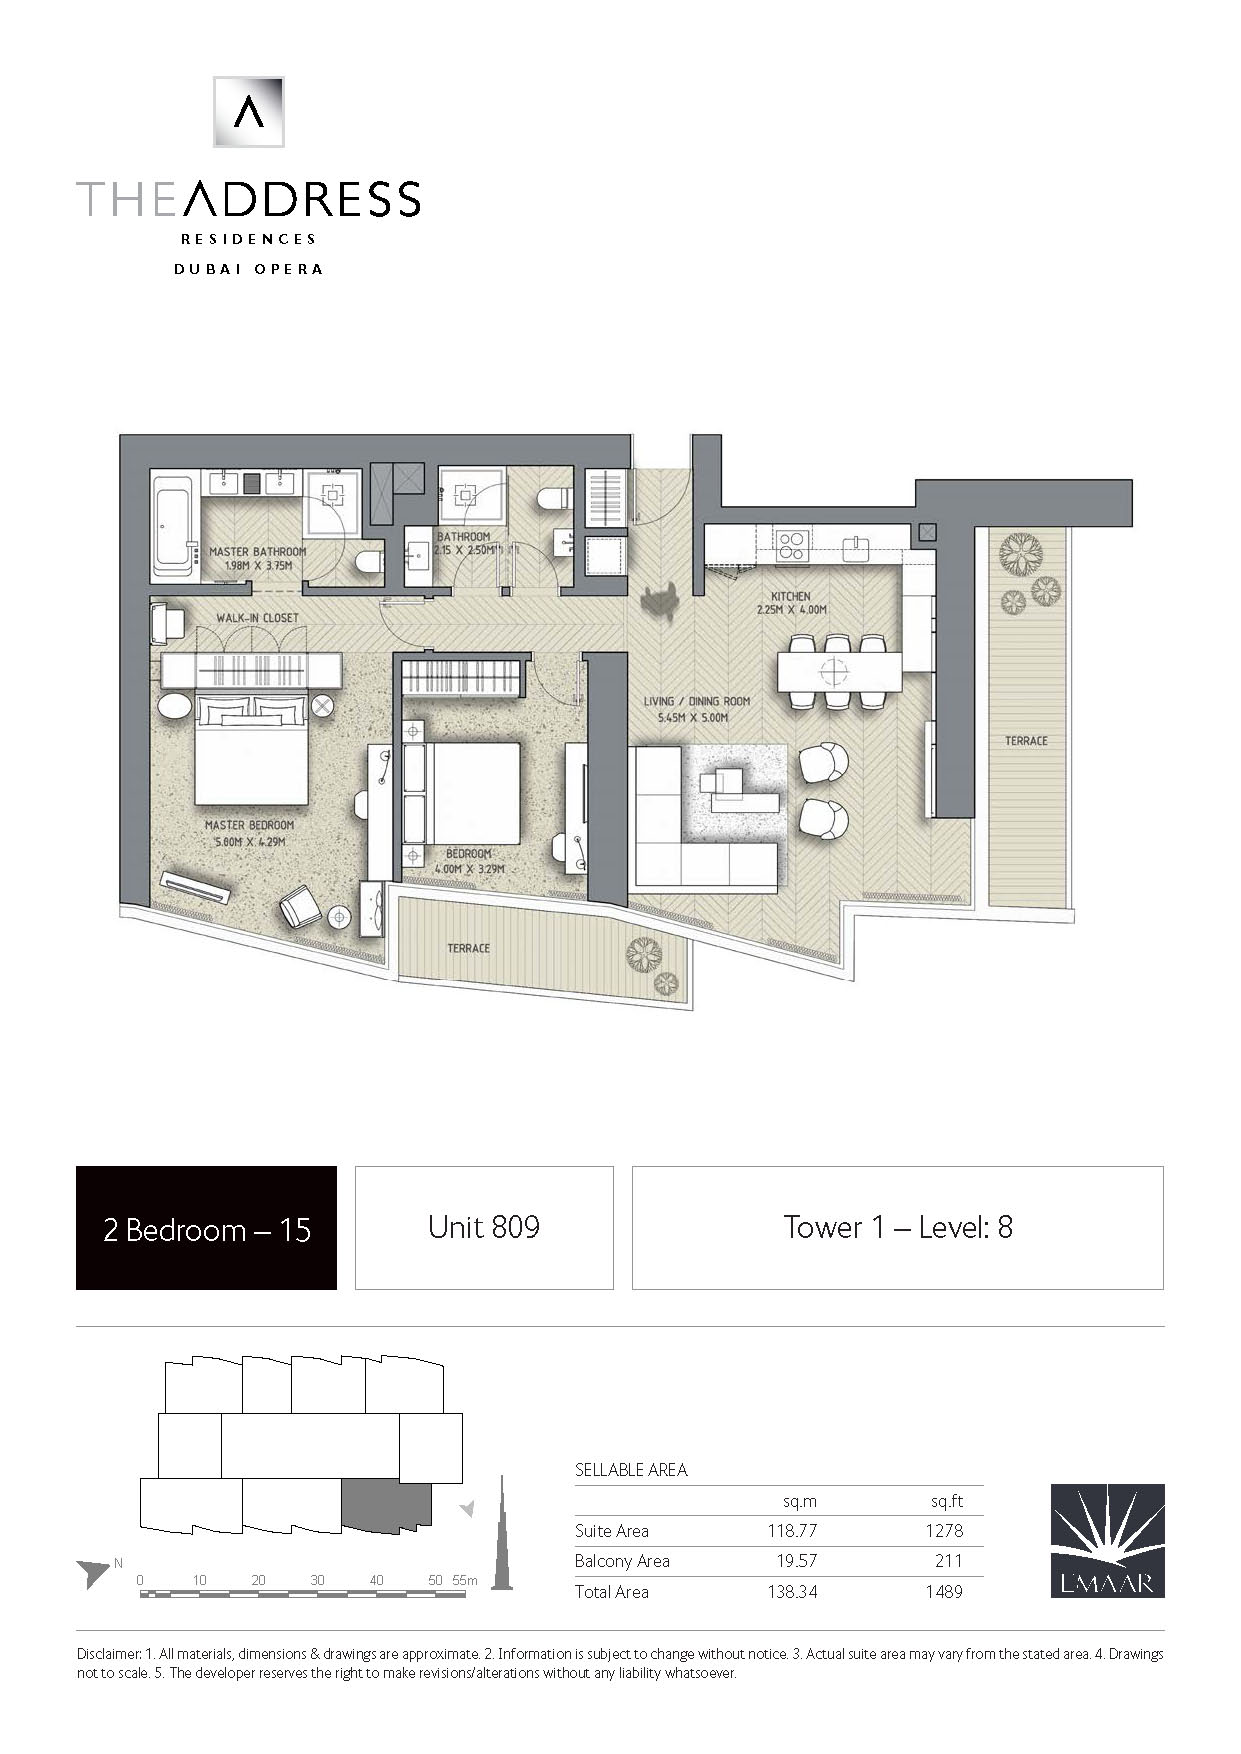 The Address Residence Dubai Opera Tower 1 Floor Plans